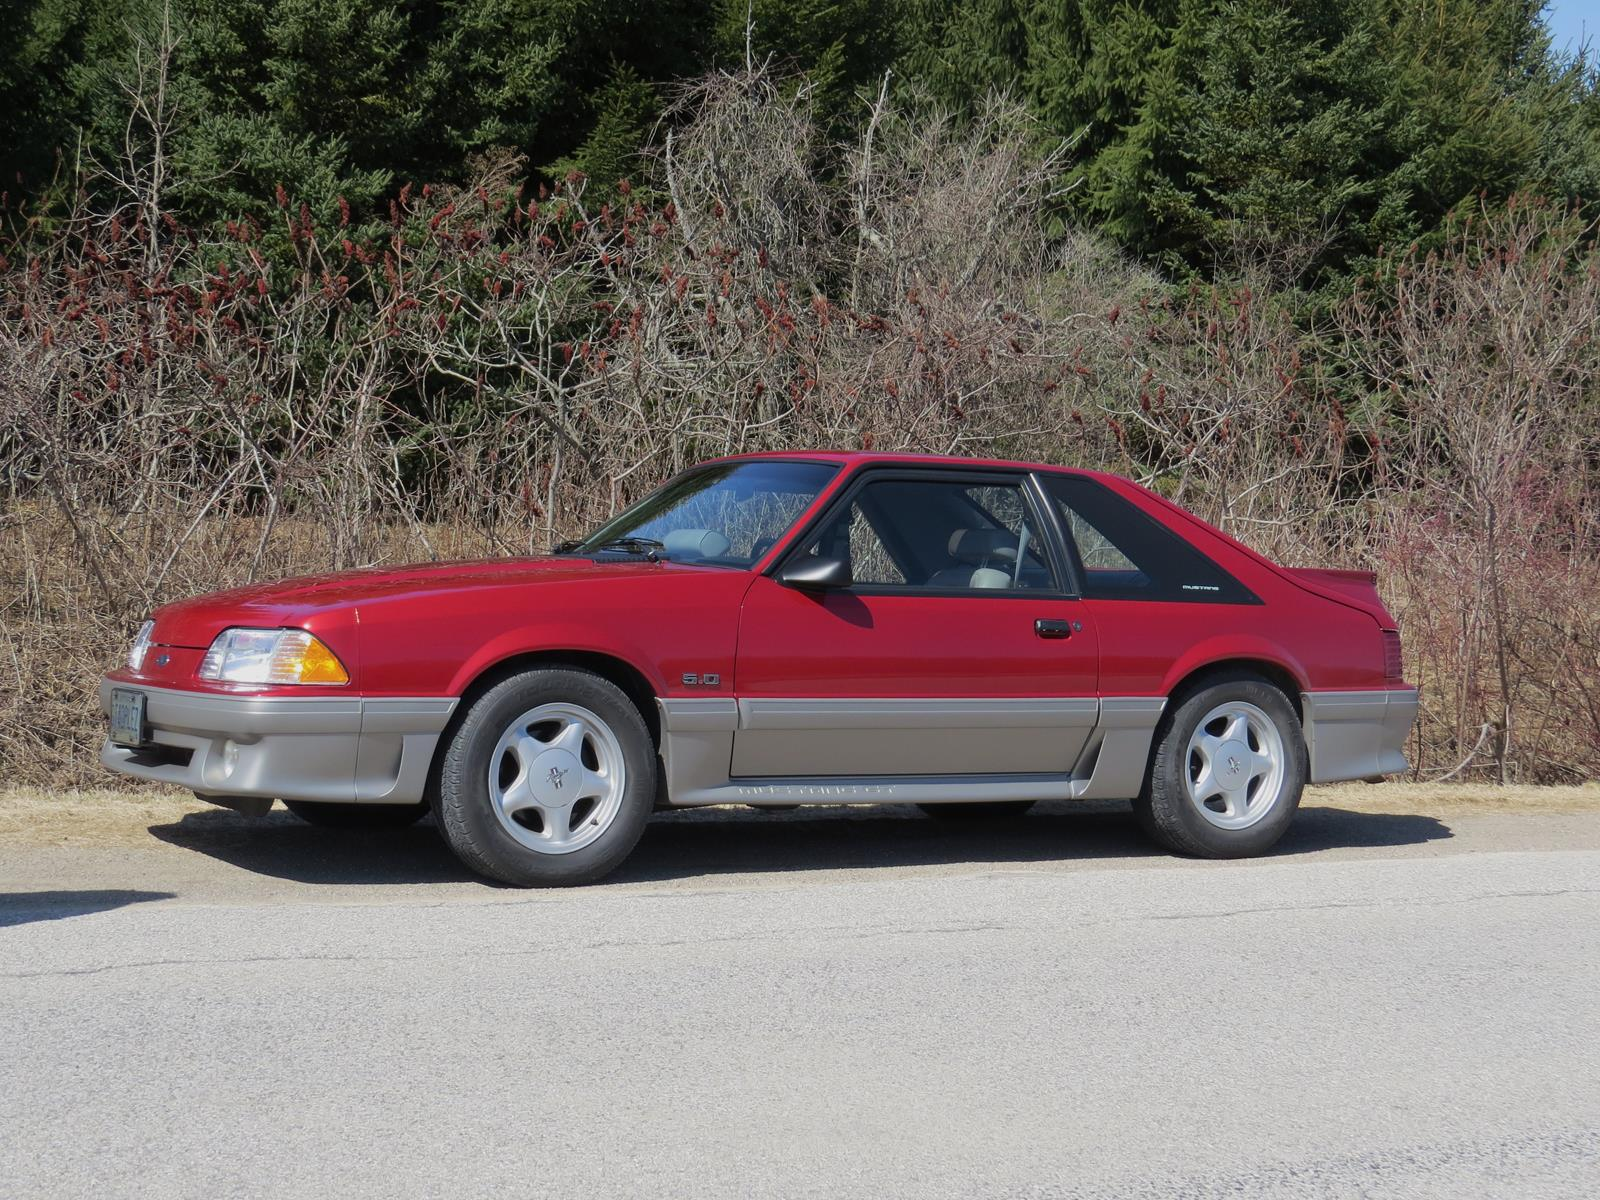 Chambers outing 1992 Mustang_1600x1200.JPG